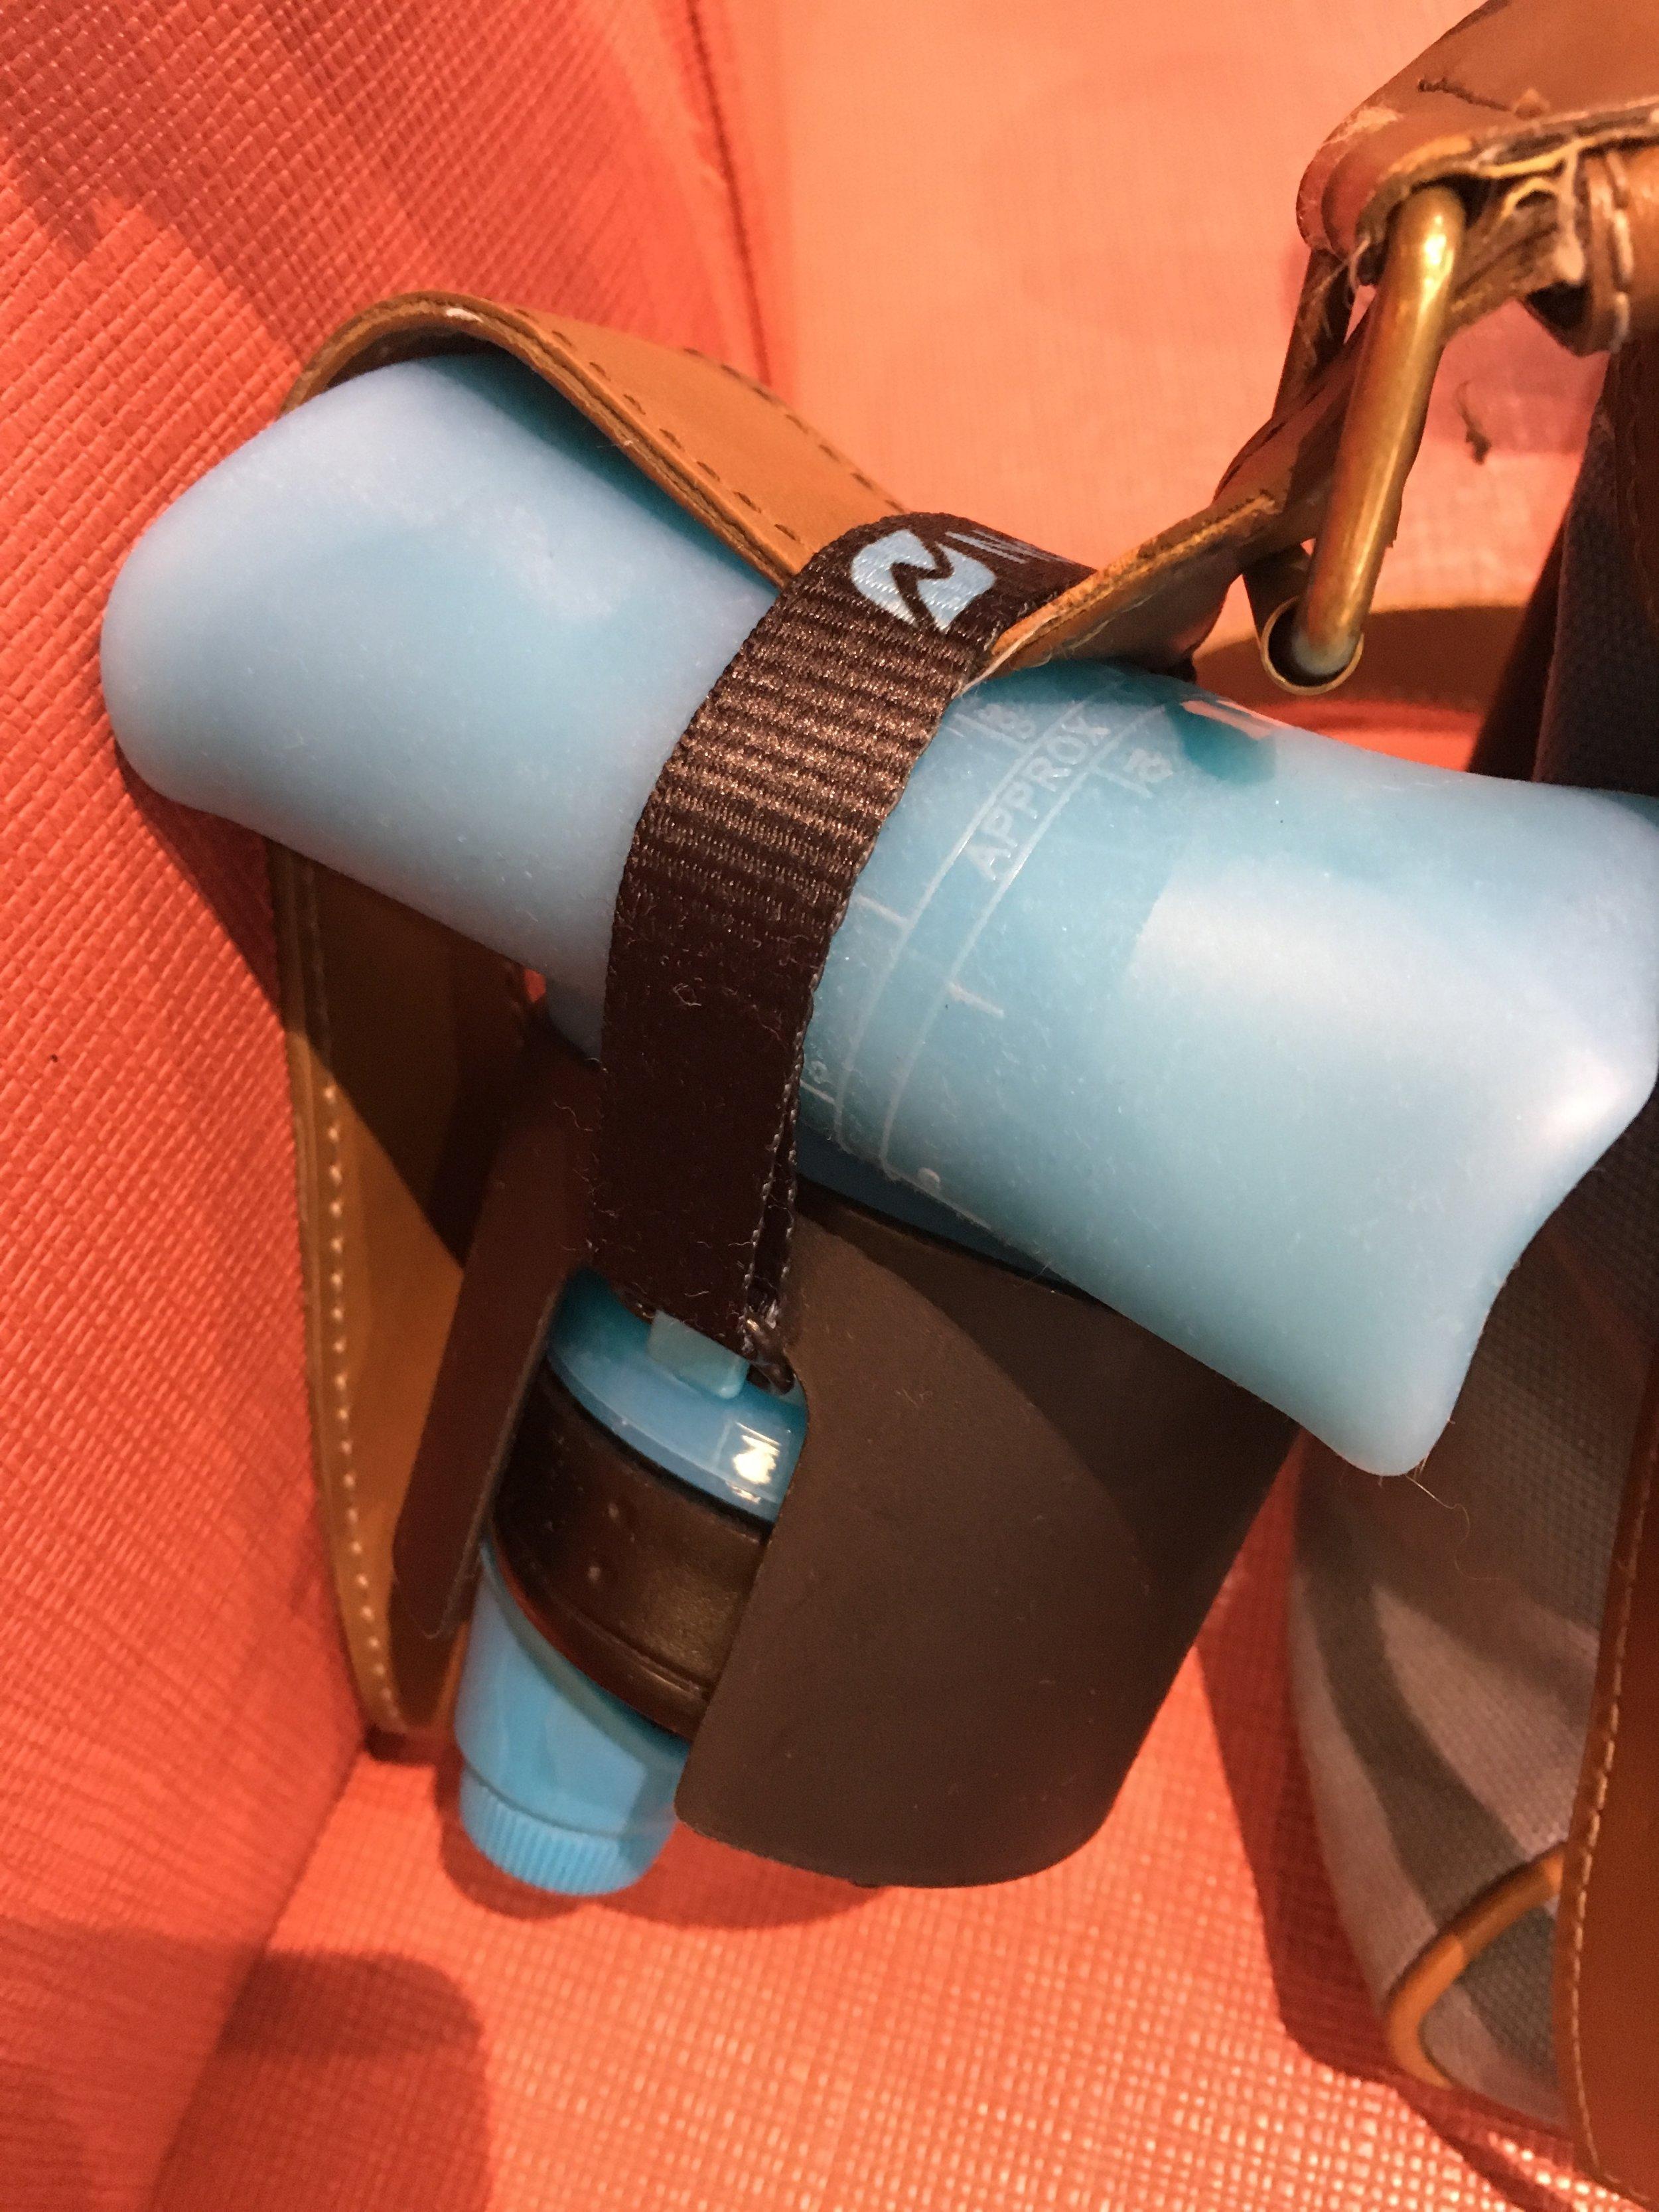 Nomader rolled for TSA screening